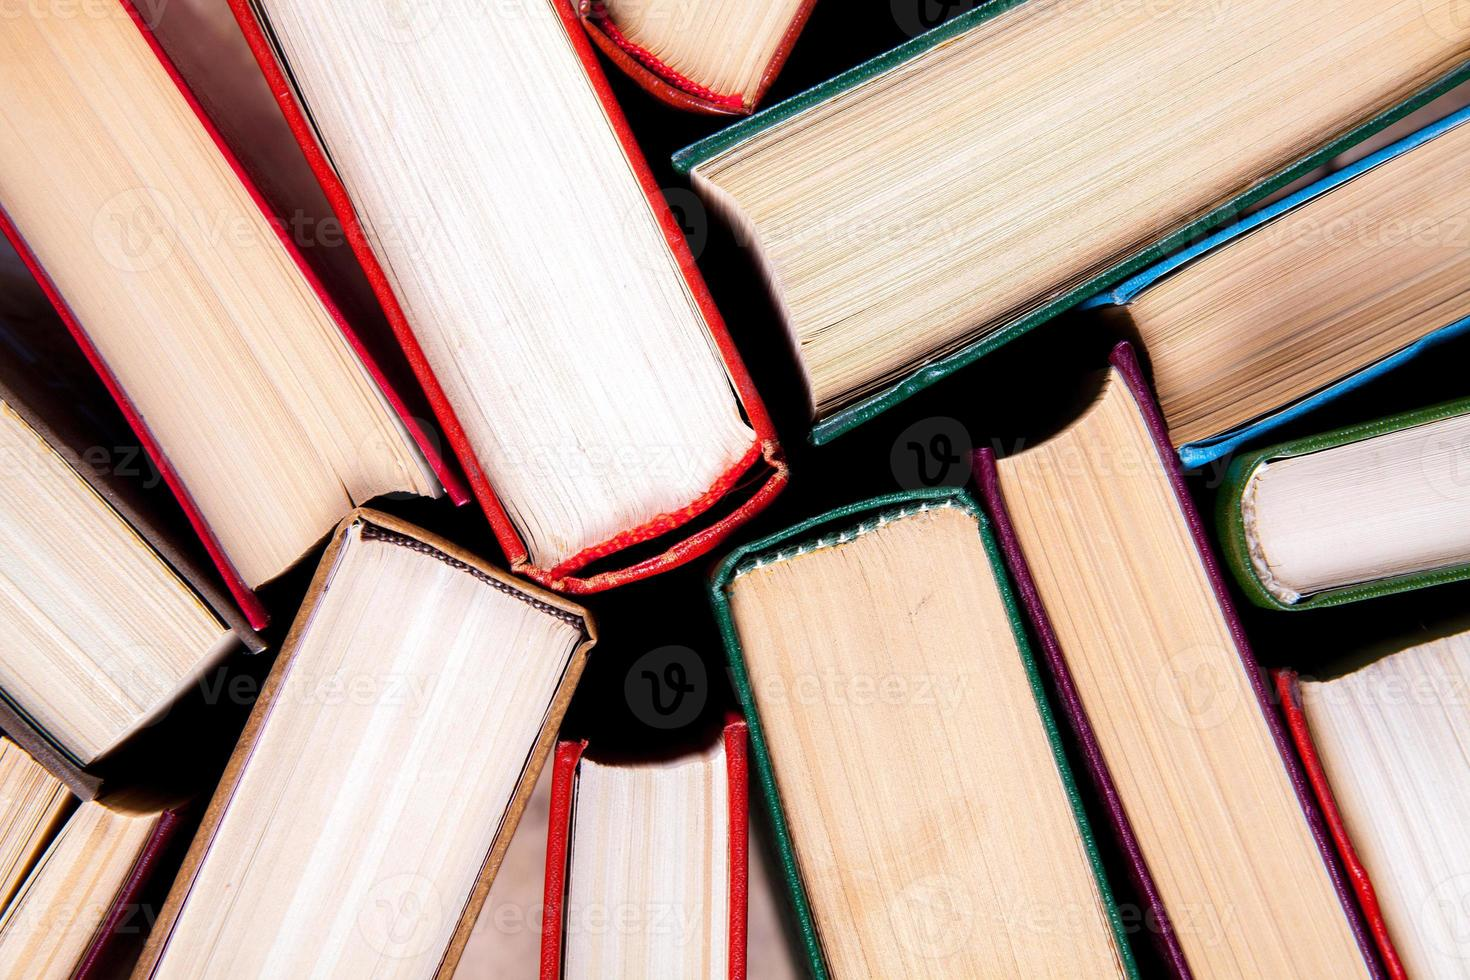 Old and used hardback books photo